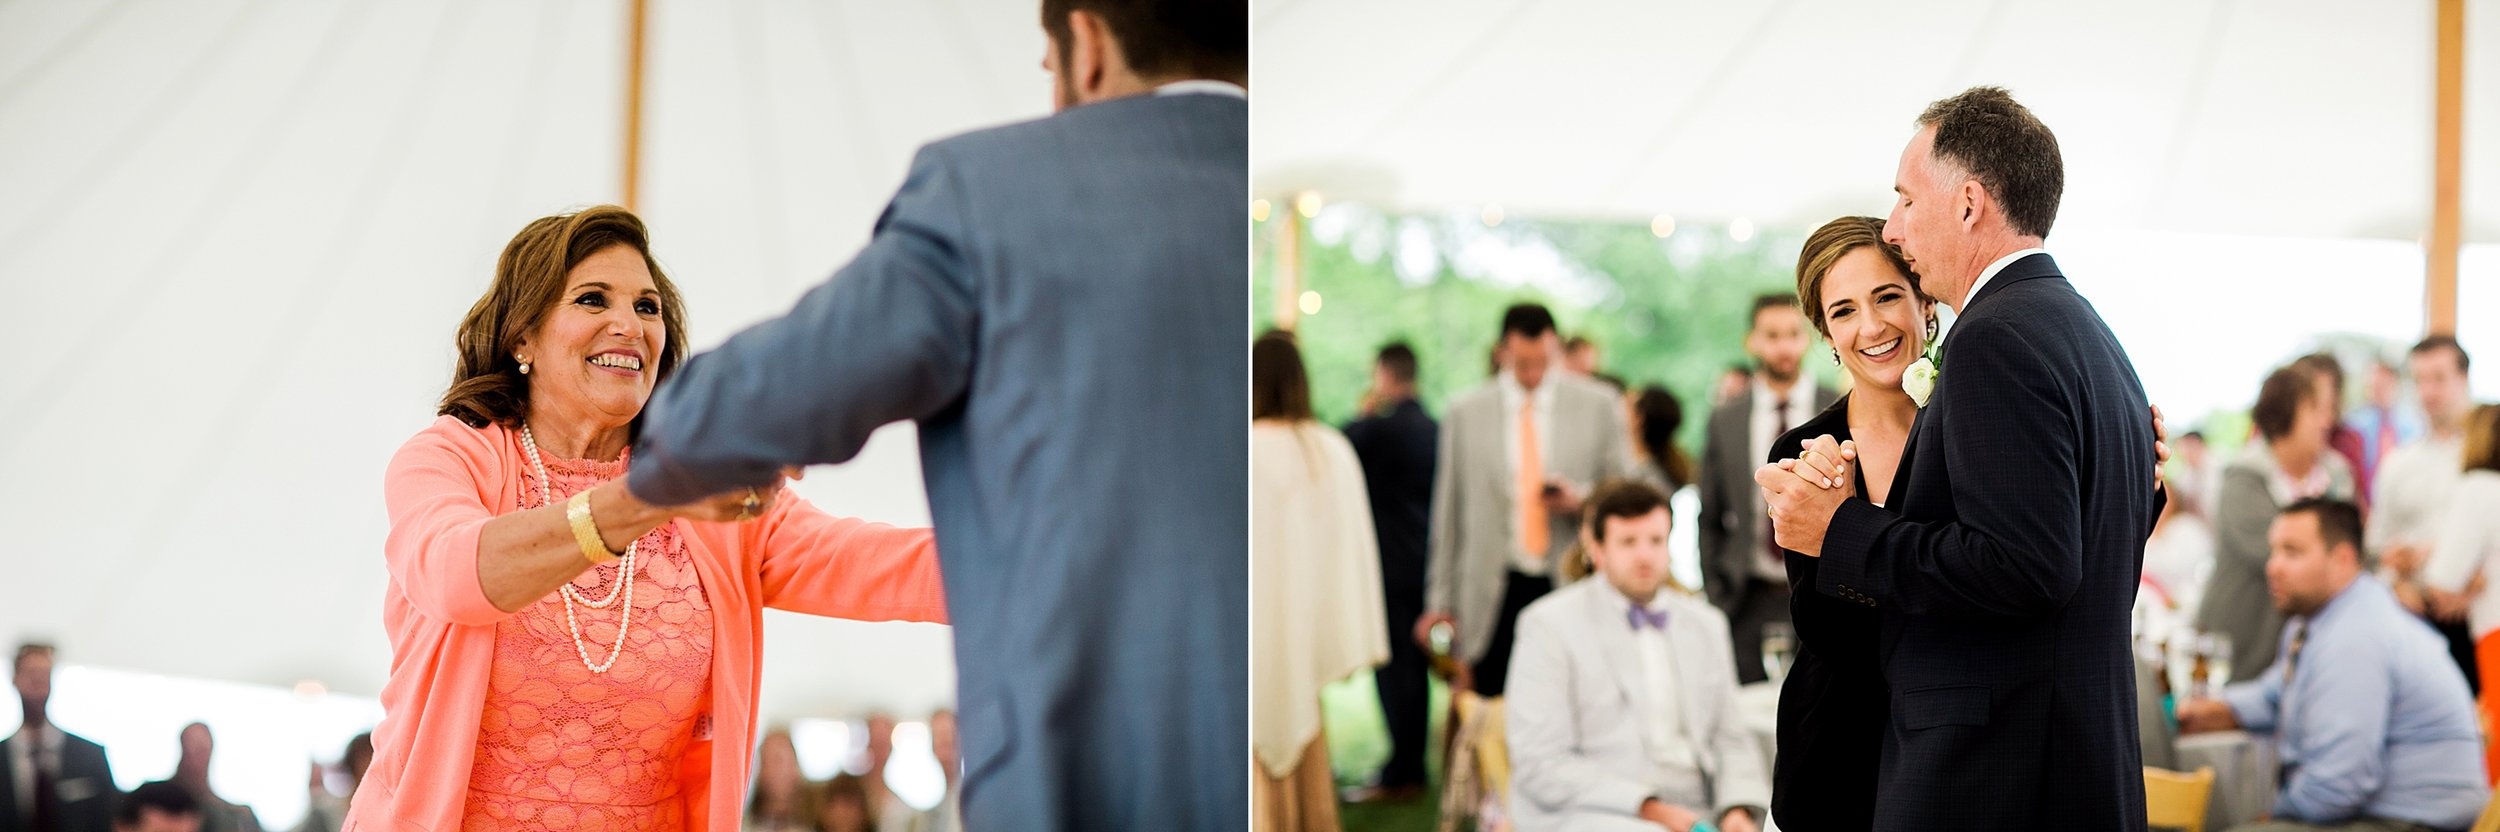 058 los angeles wedding photographer todd danforth photography cape cod.jpg